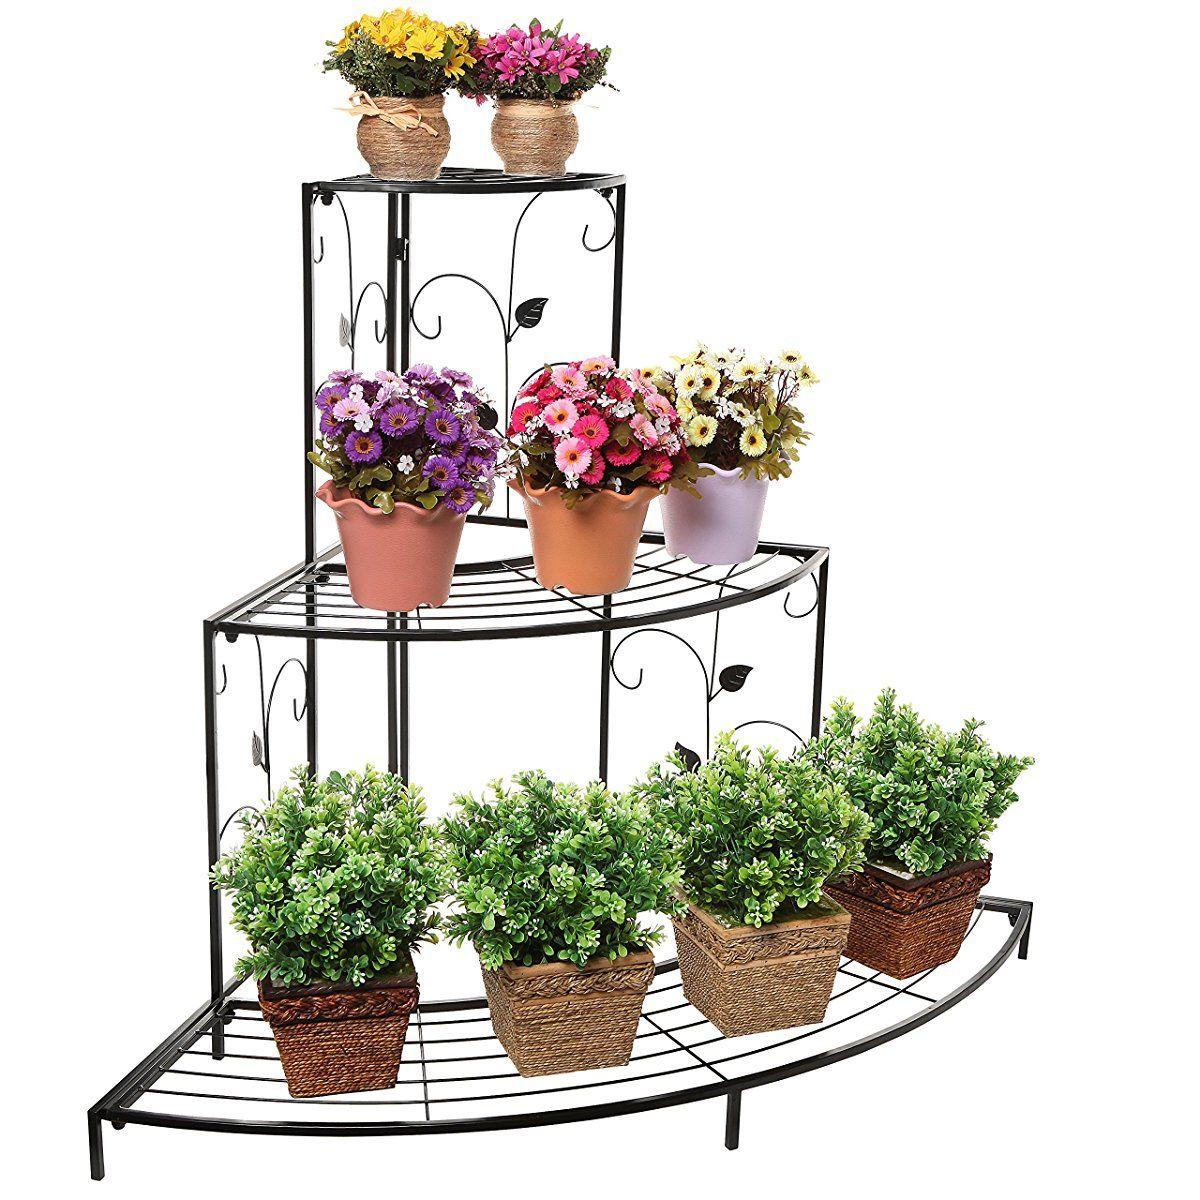 3 Tier Corner Shelf Flower Pots Flower Pots Flower Pot Design Outdoor Metal Plant Stands